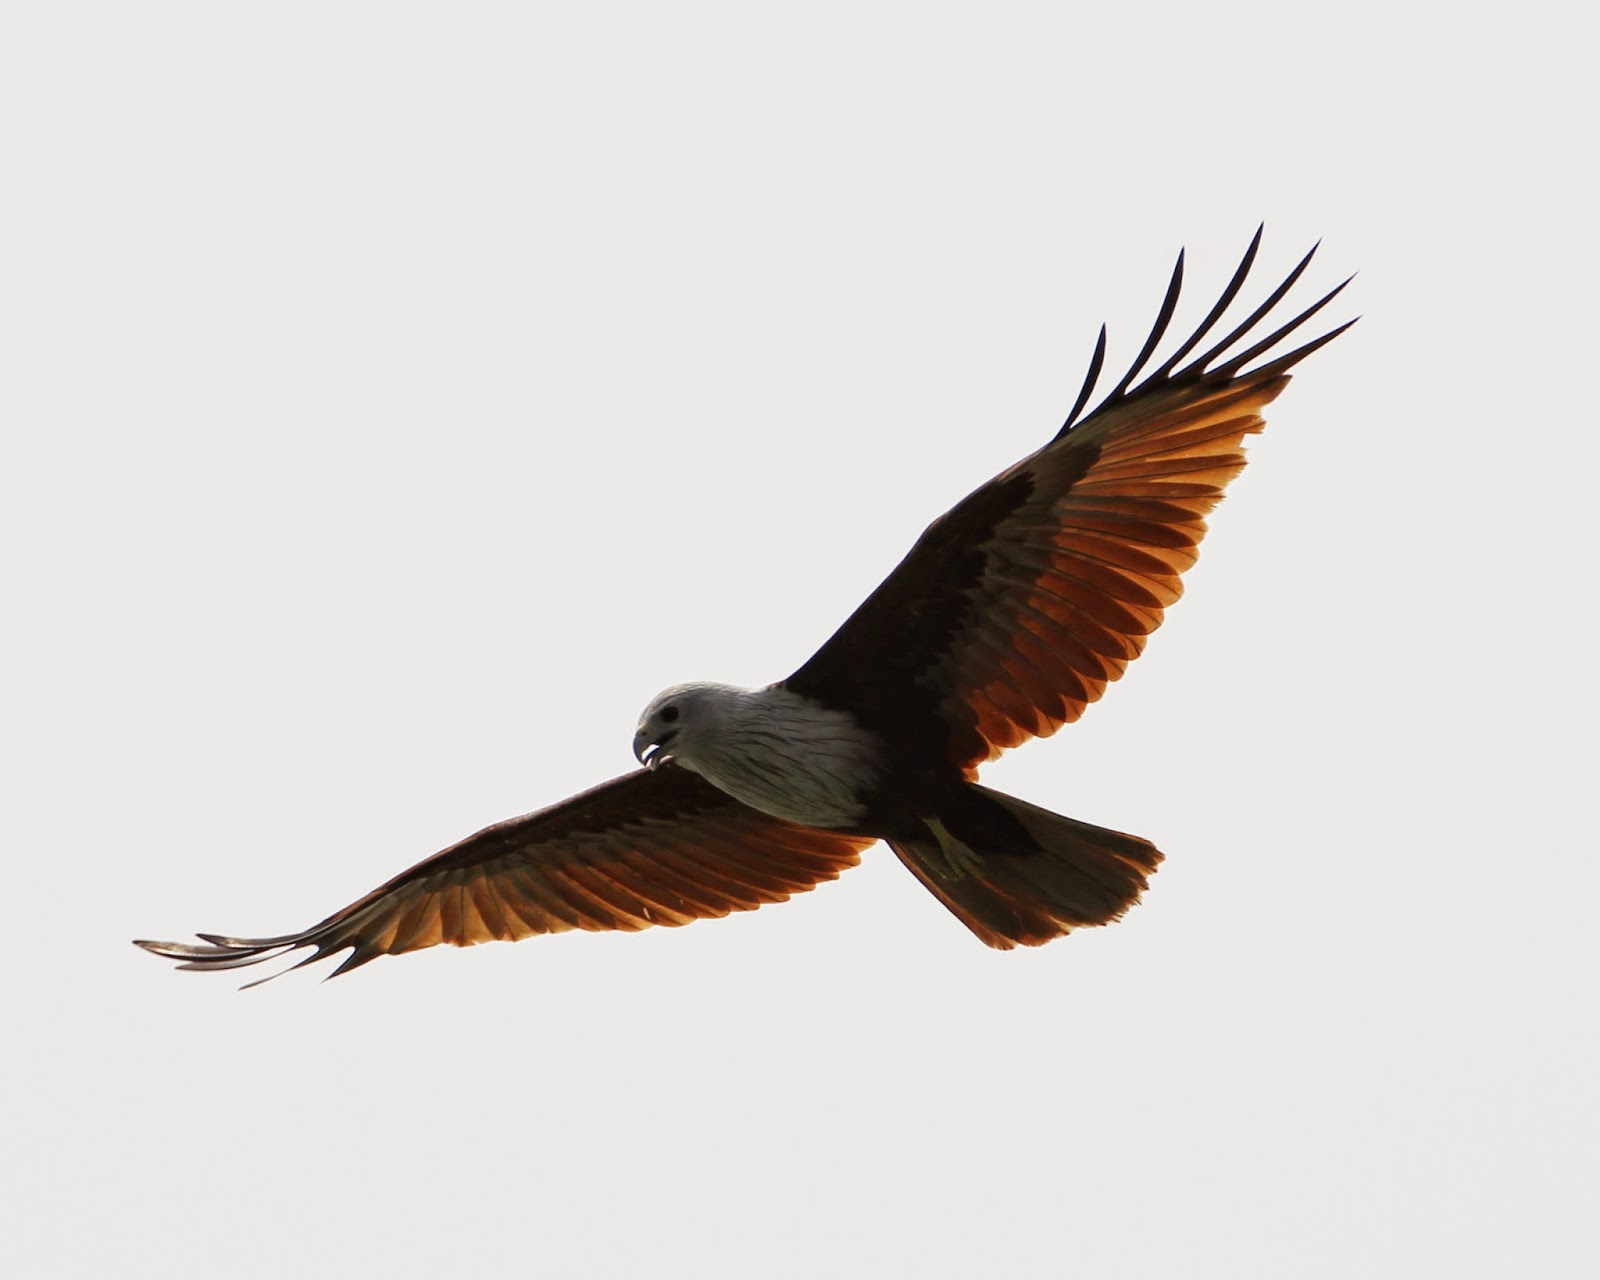 Eagle Sight Seeing Tour Sdn Bhd